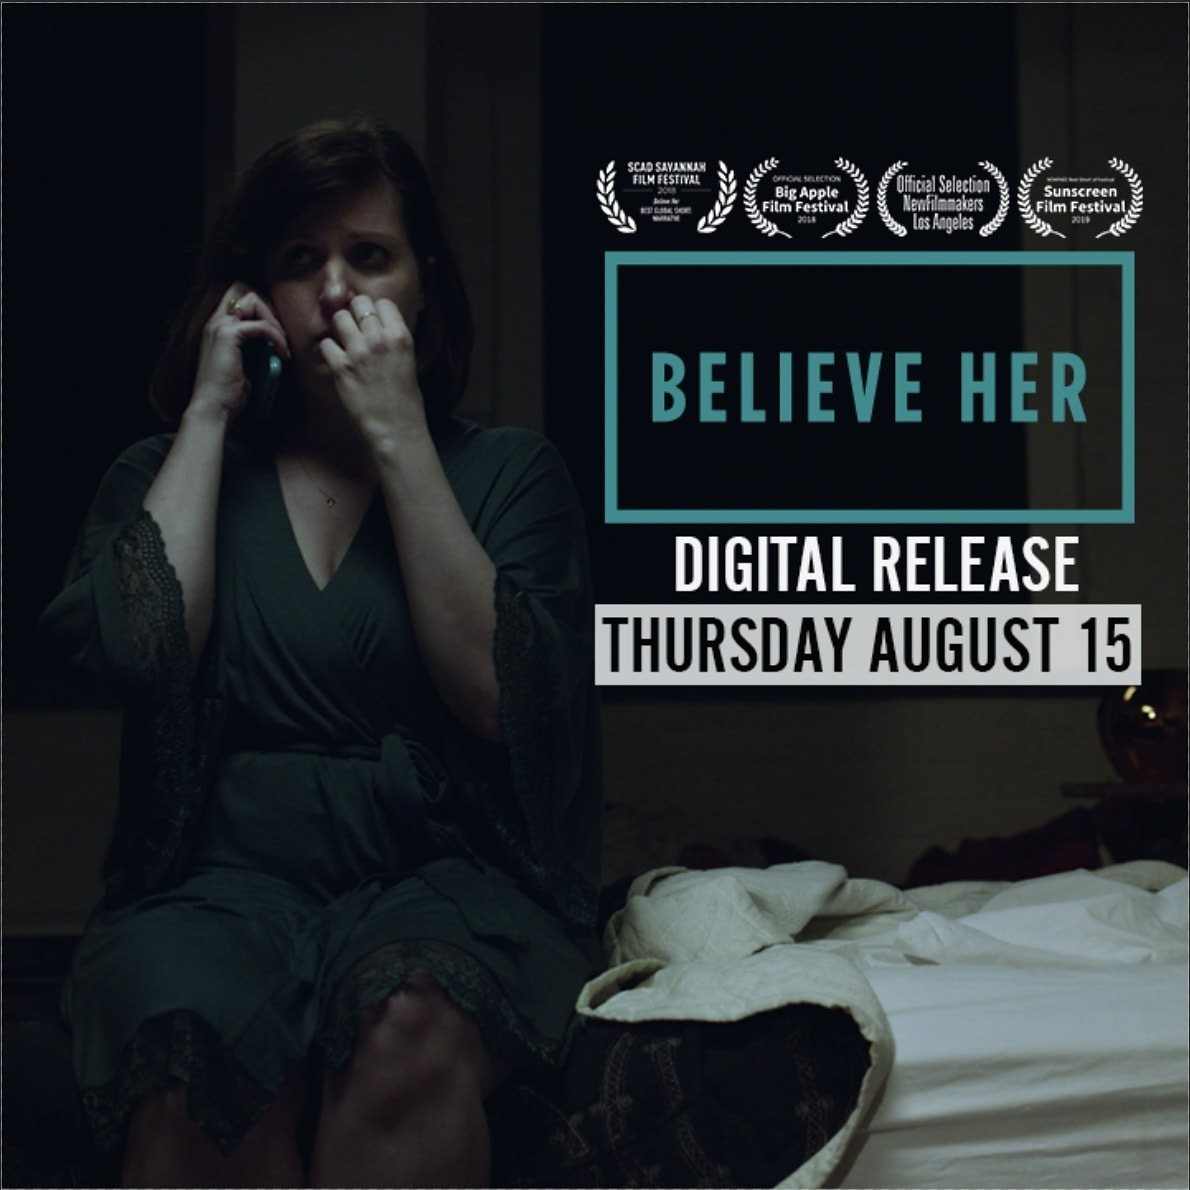 Believe Her stars Allison Tolman.